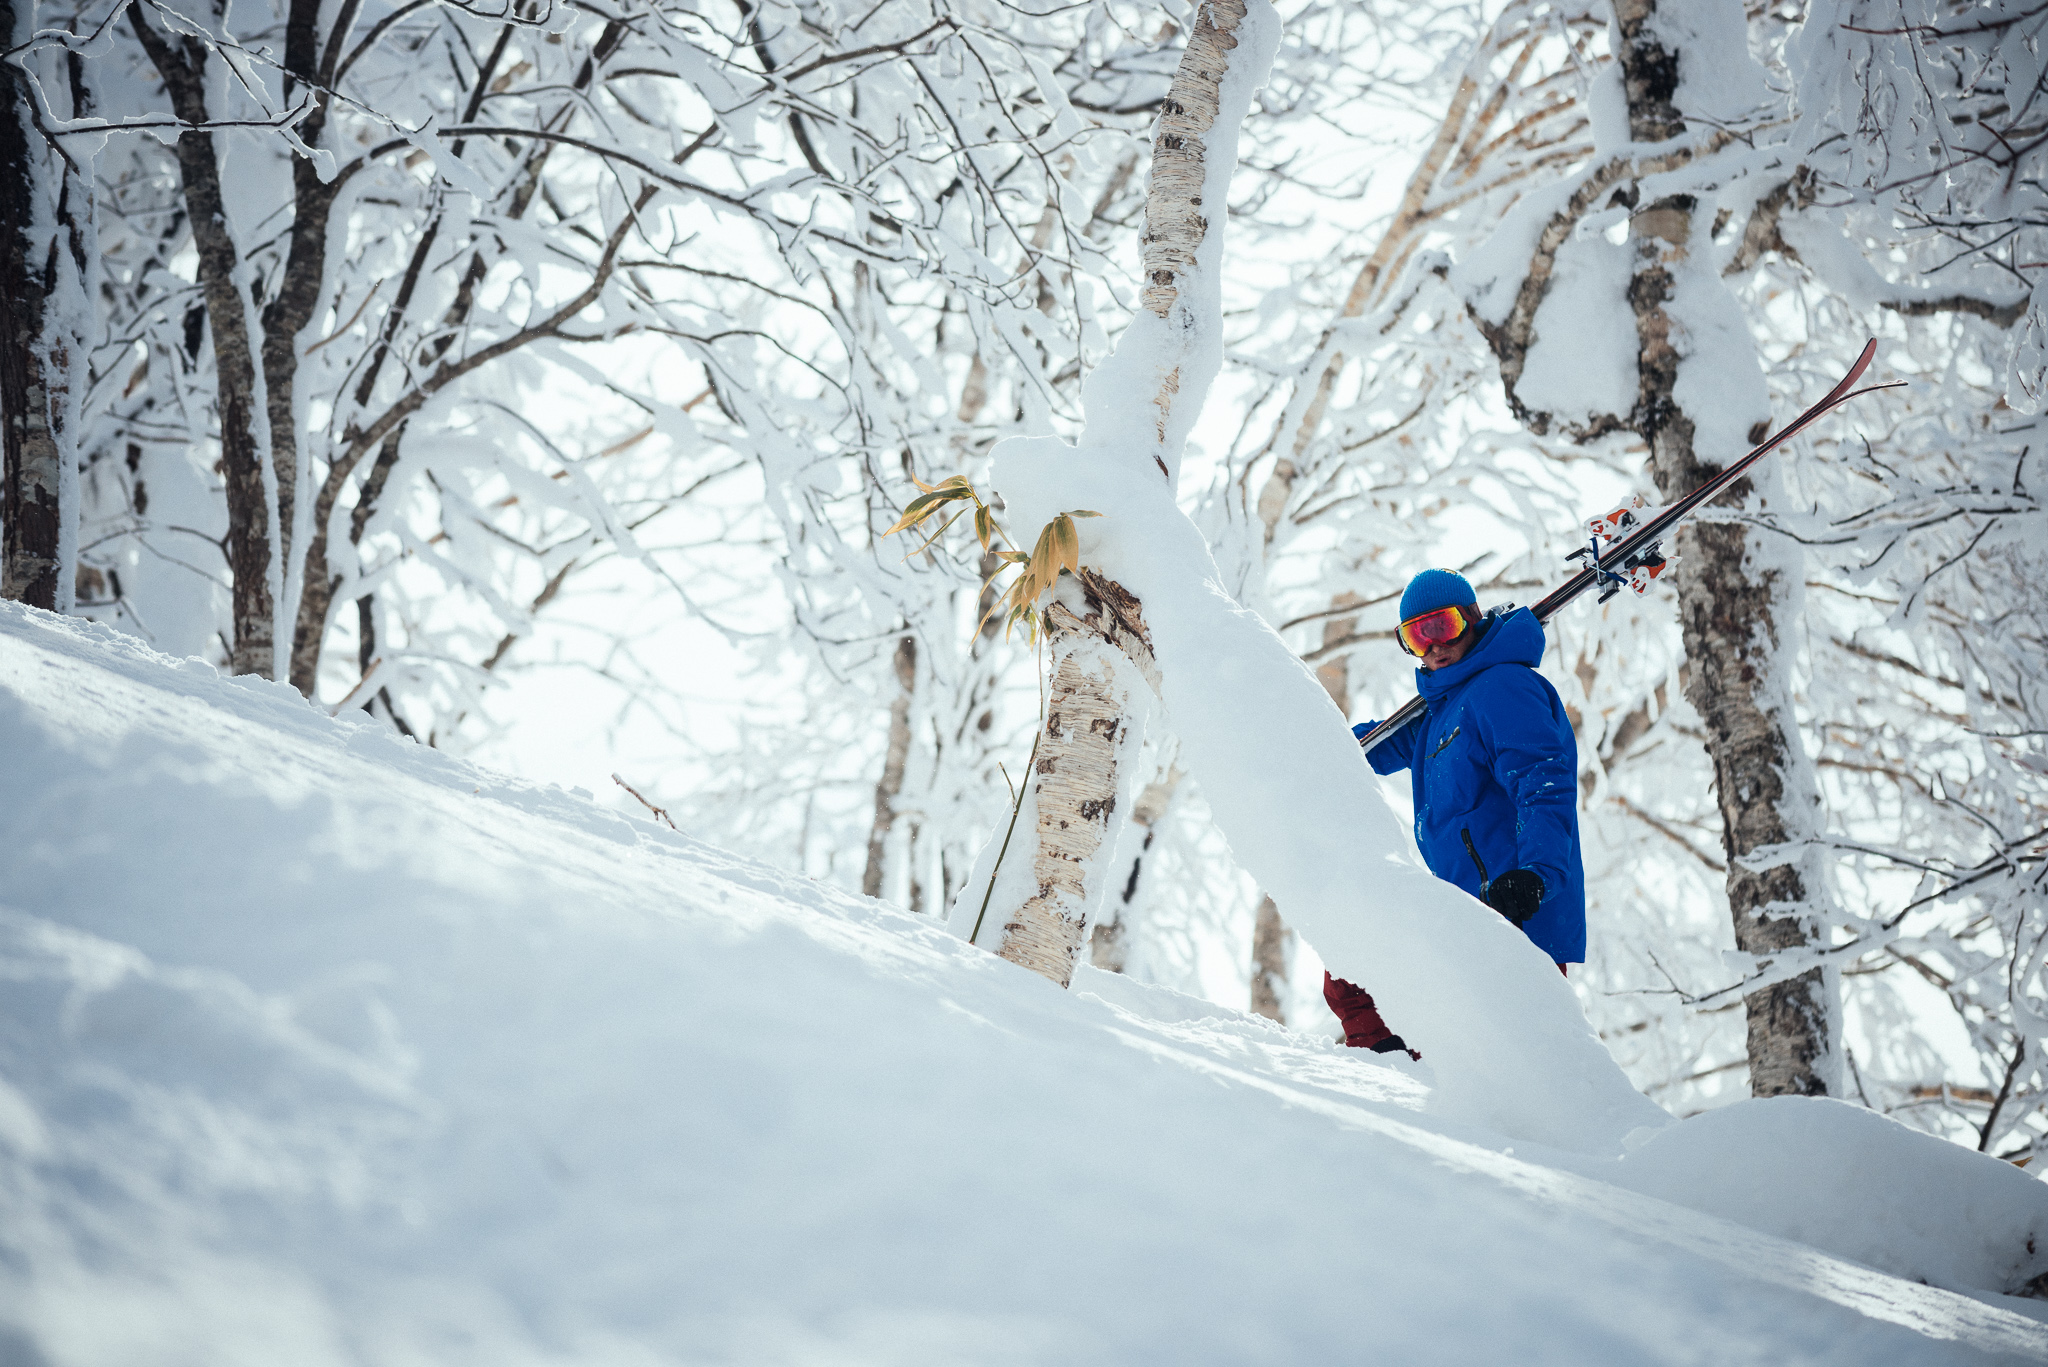 Jake pauses on his hike for another run at Rusutsu Ski Resort, Japan.